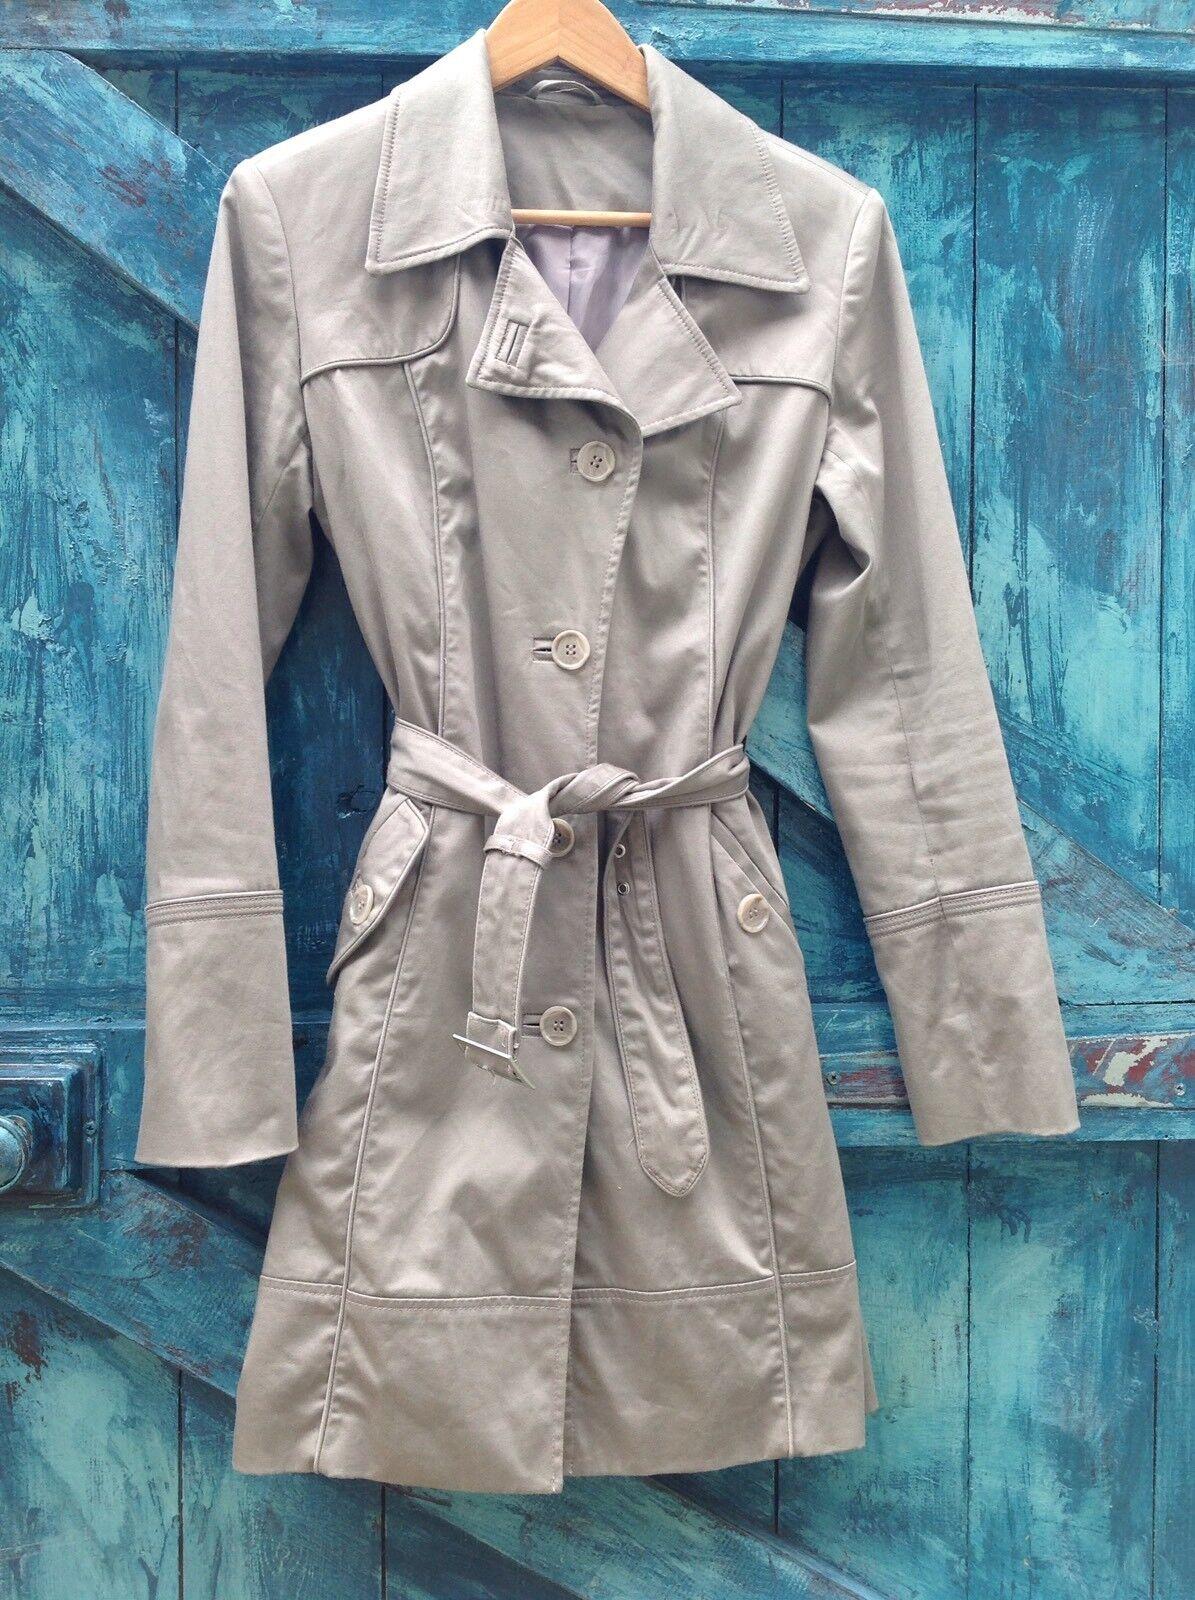 Womens Trench Coat NEXT Sexy raincoat Flasher Mac Vgc